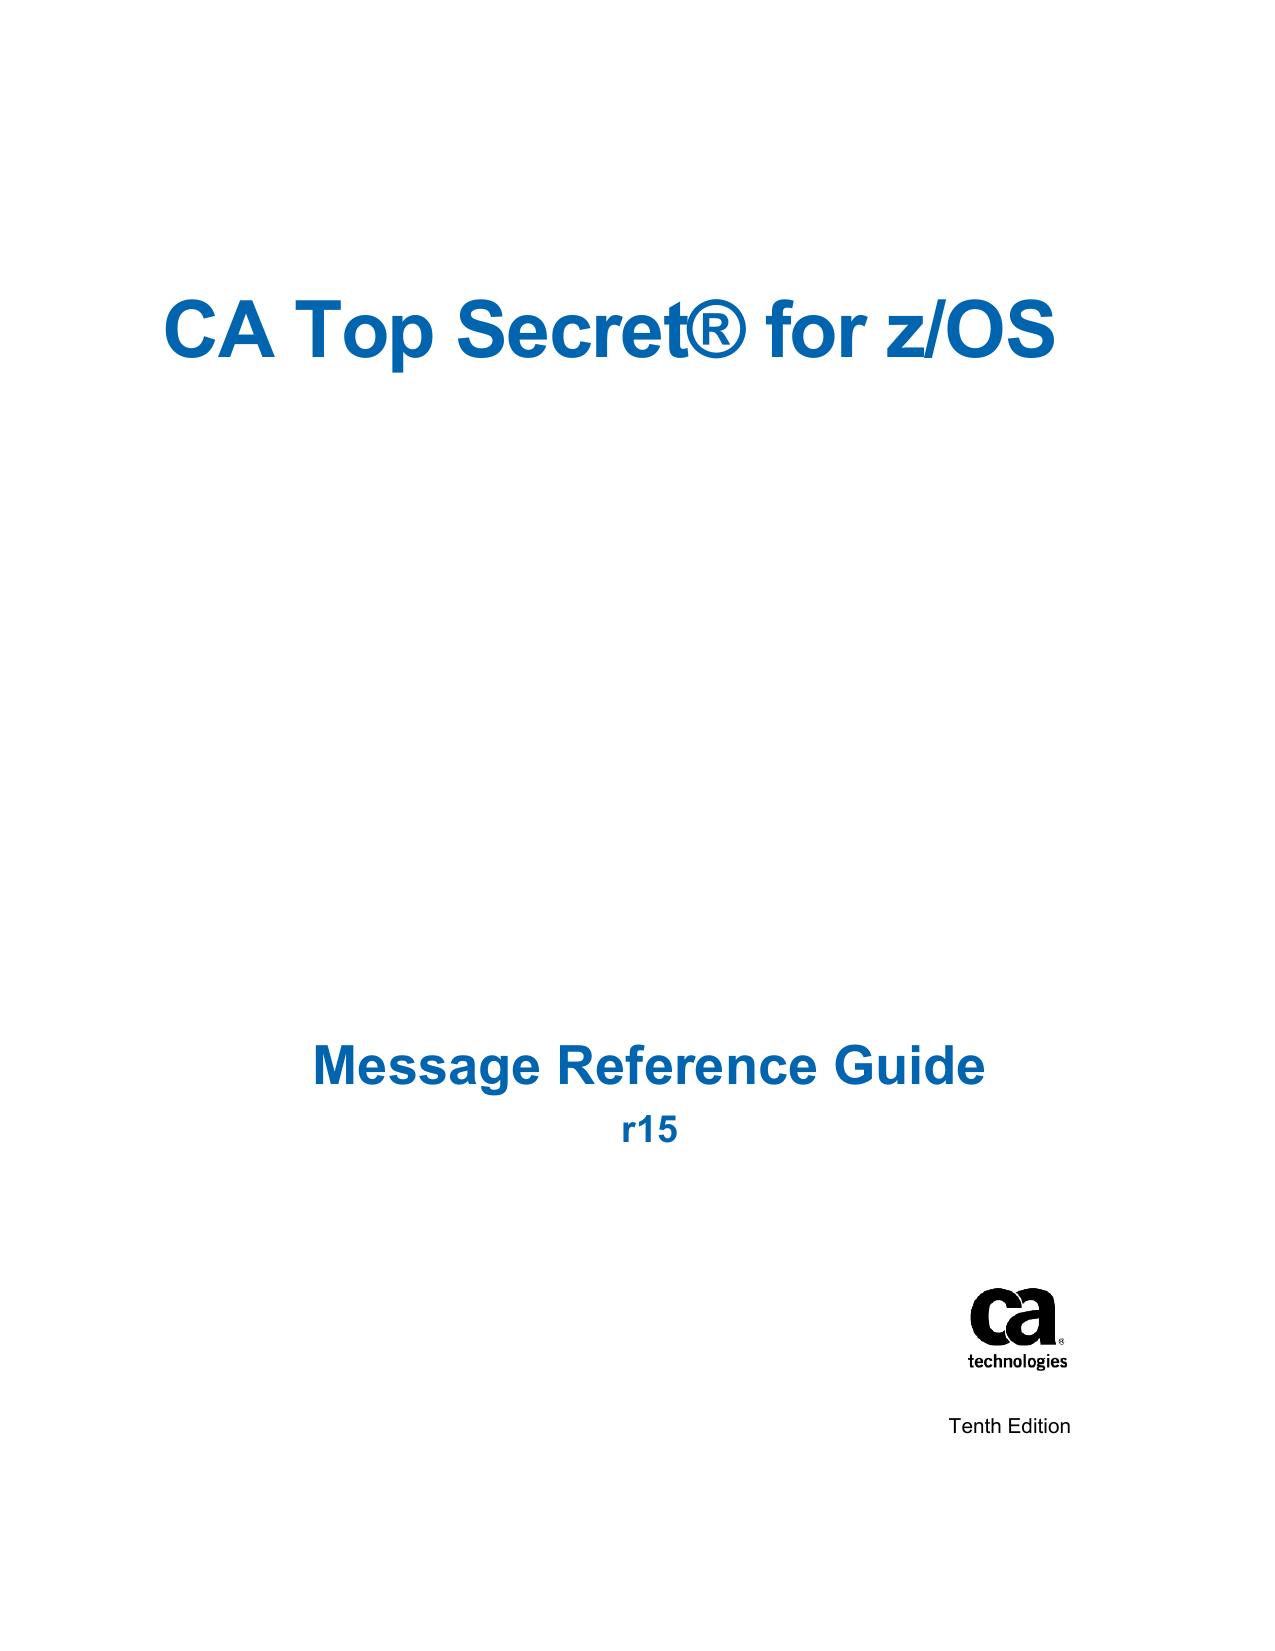 Ca top secret for z/os pdf free download.